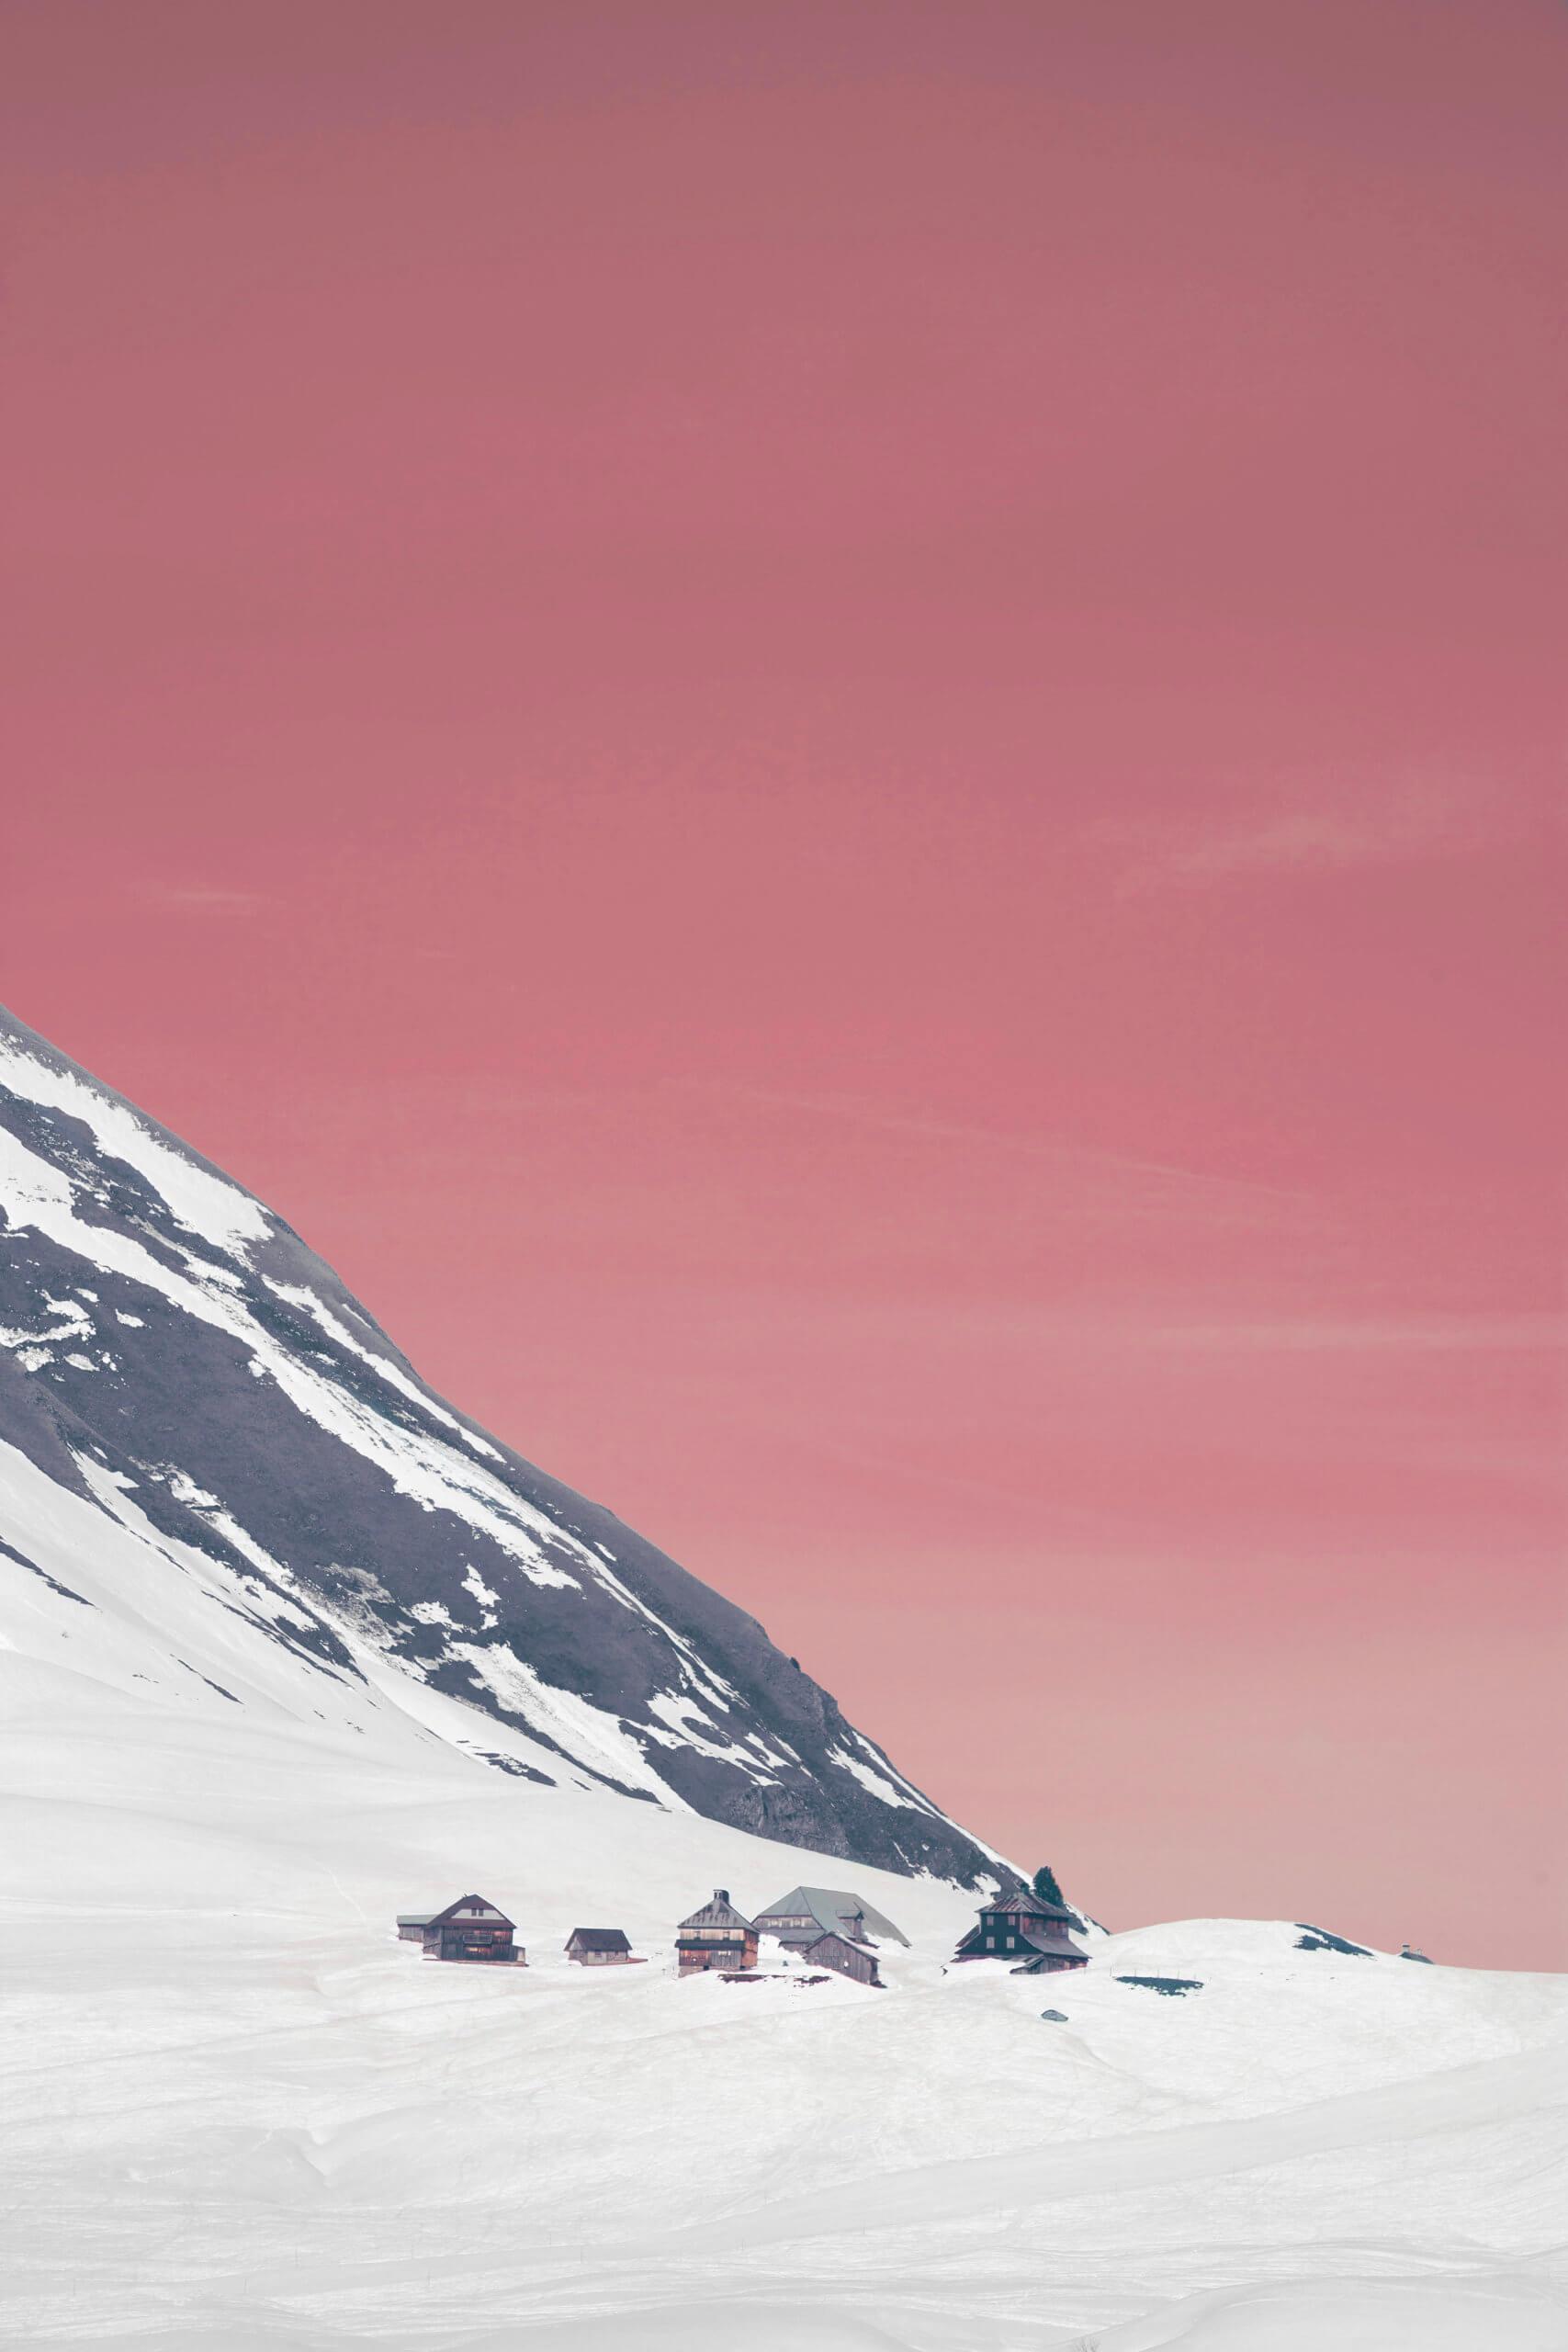 charlotte-pilat-altitude-01